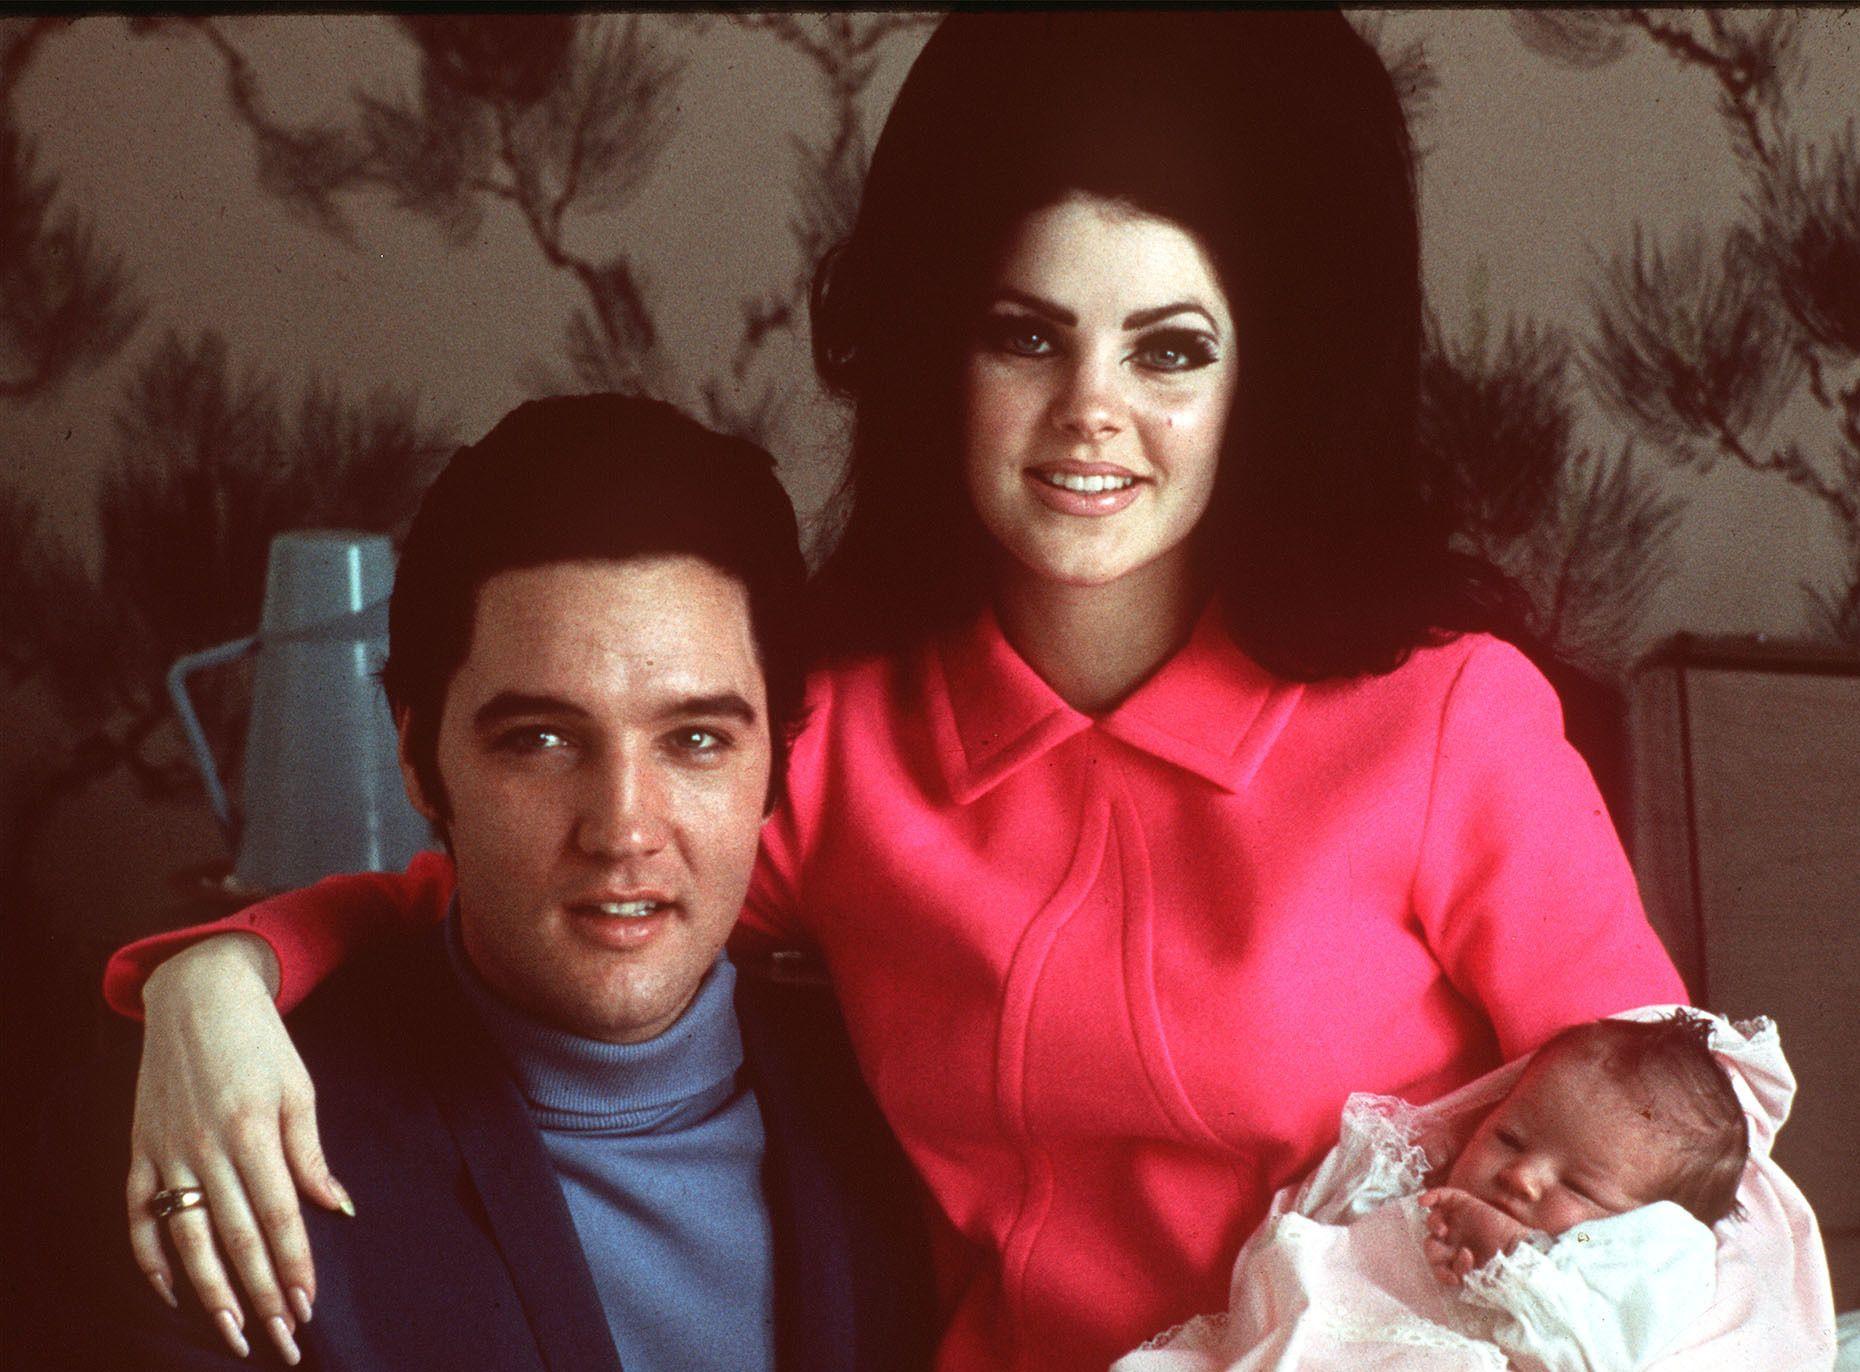 LYKKELIGERE TIDER: Elvis Presley og Priscilla med nyfødte Lisa Marie i 1968.